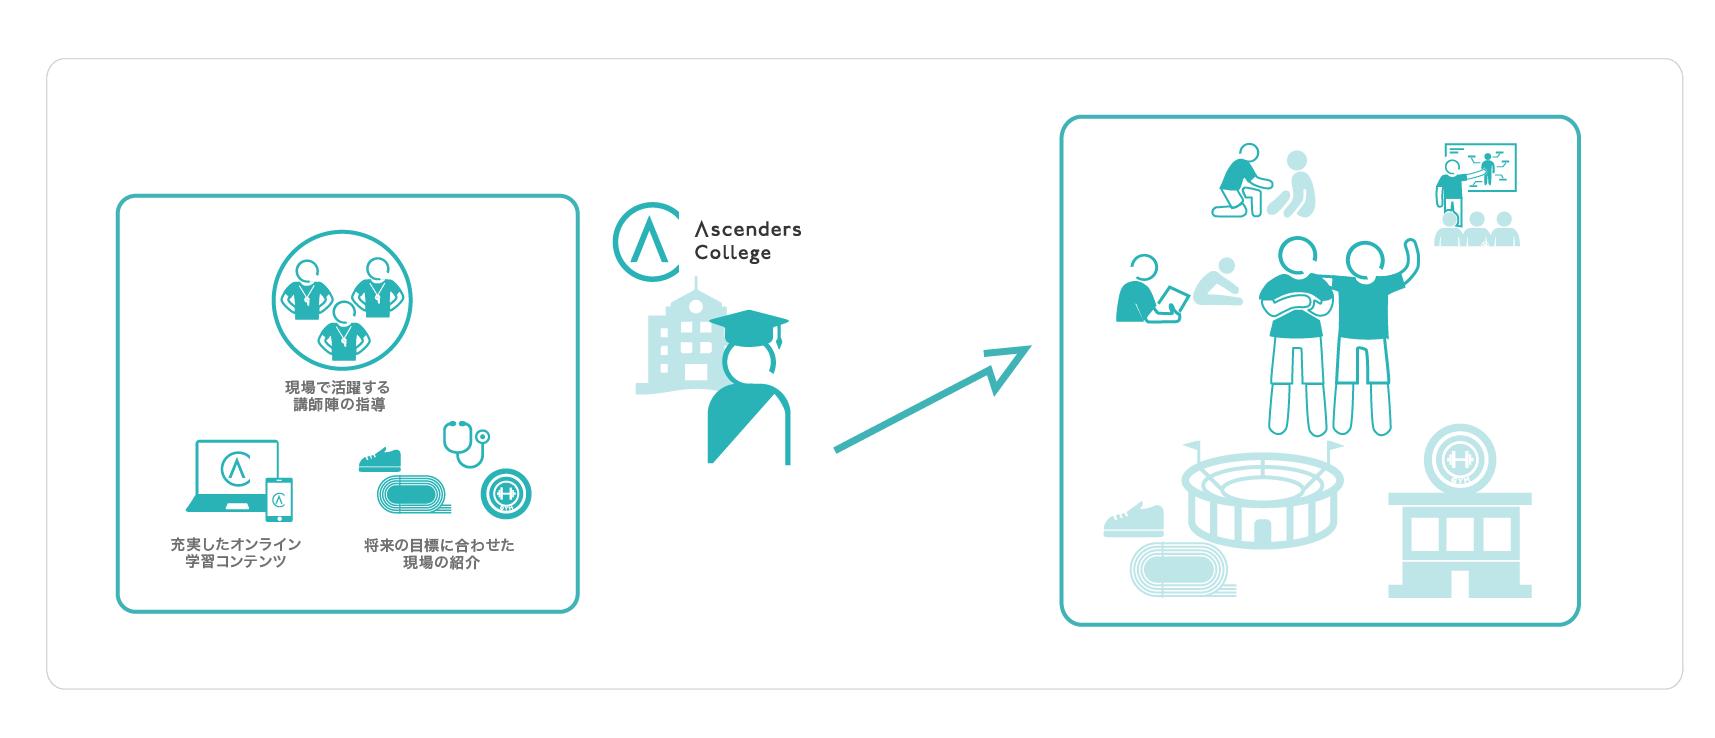 Ascenders College説明図